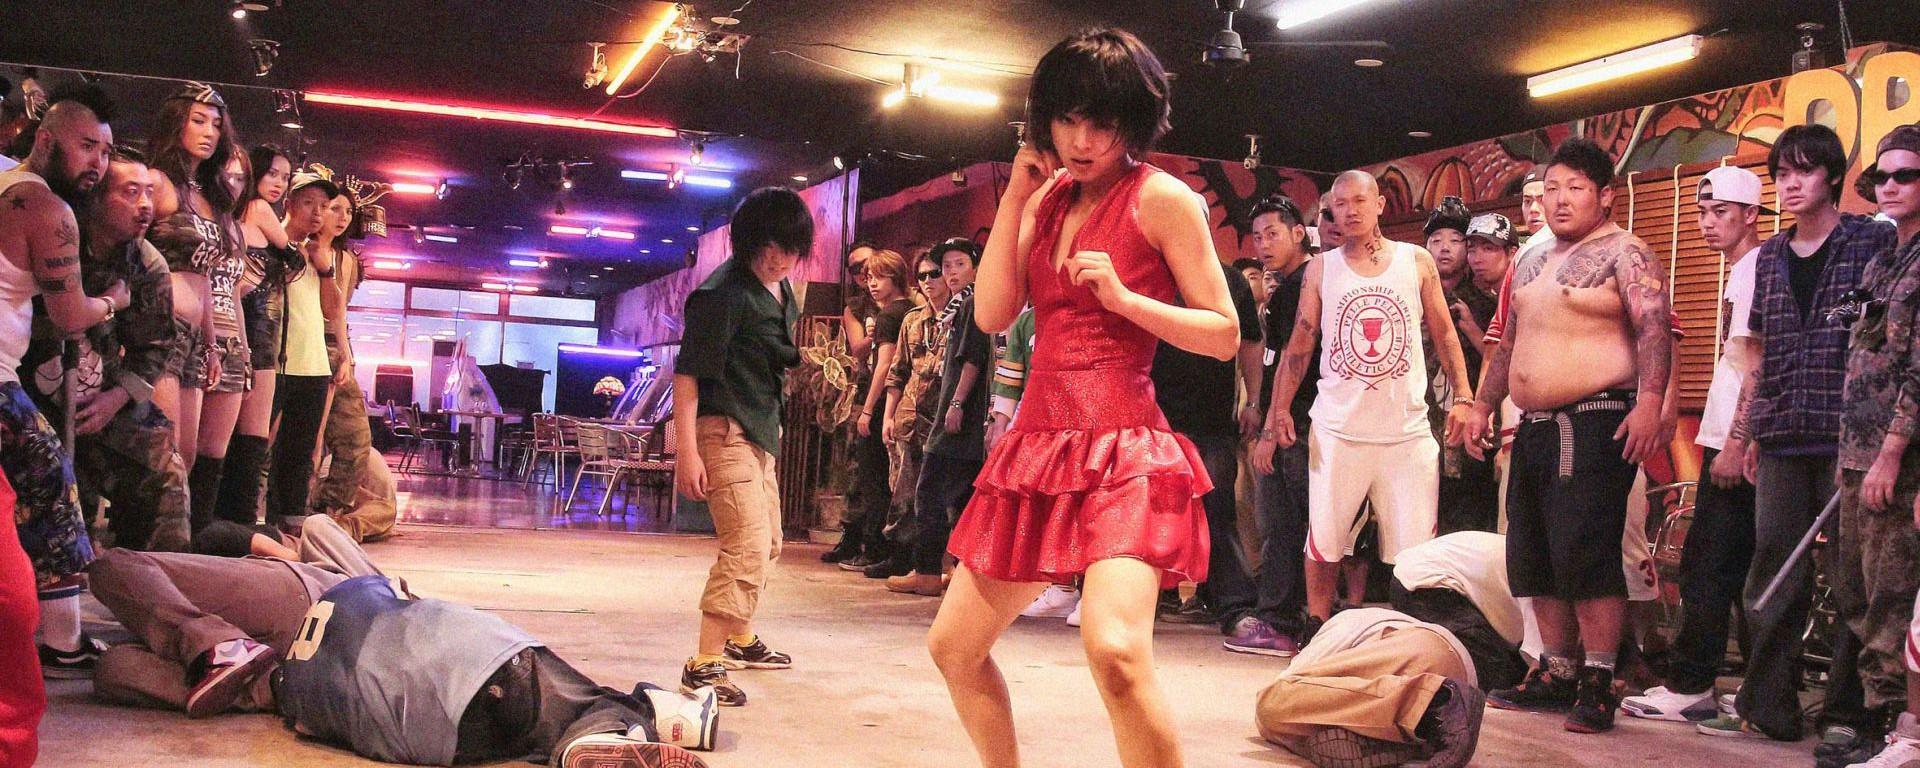 tokyo tribe black movie spoutnik